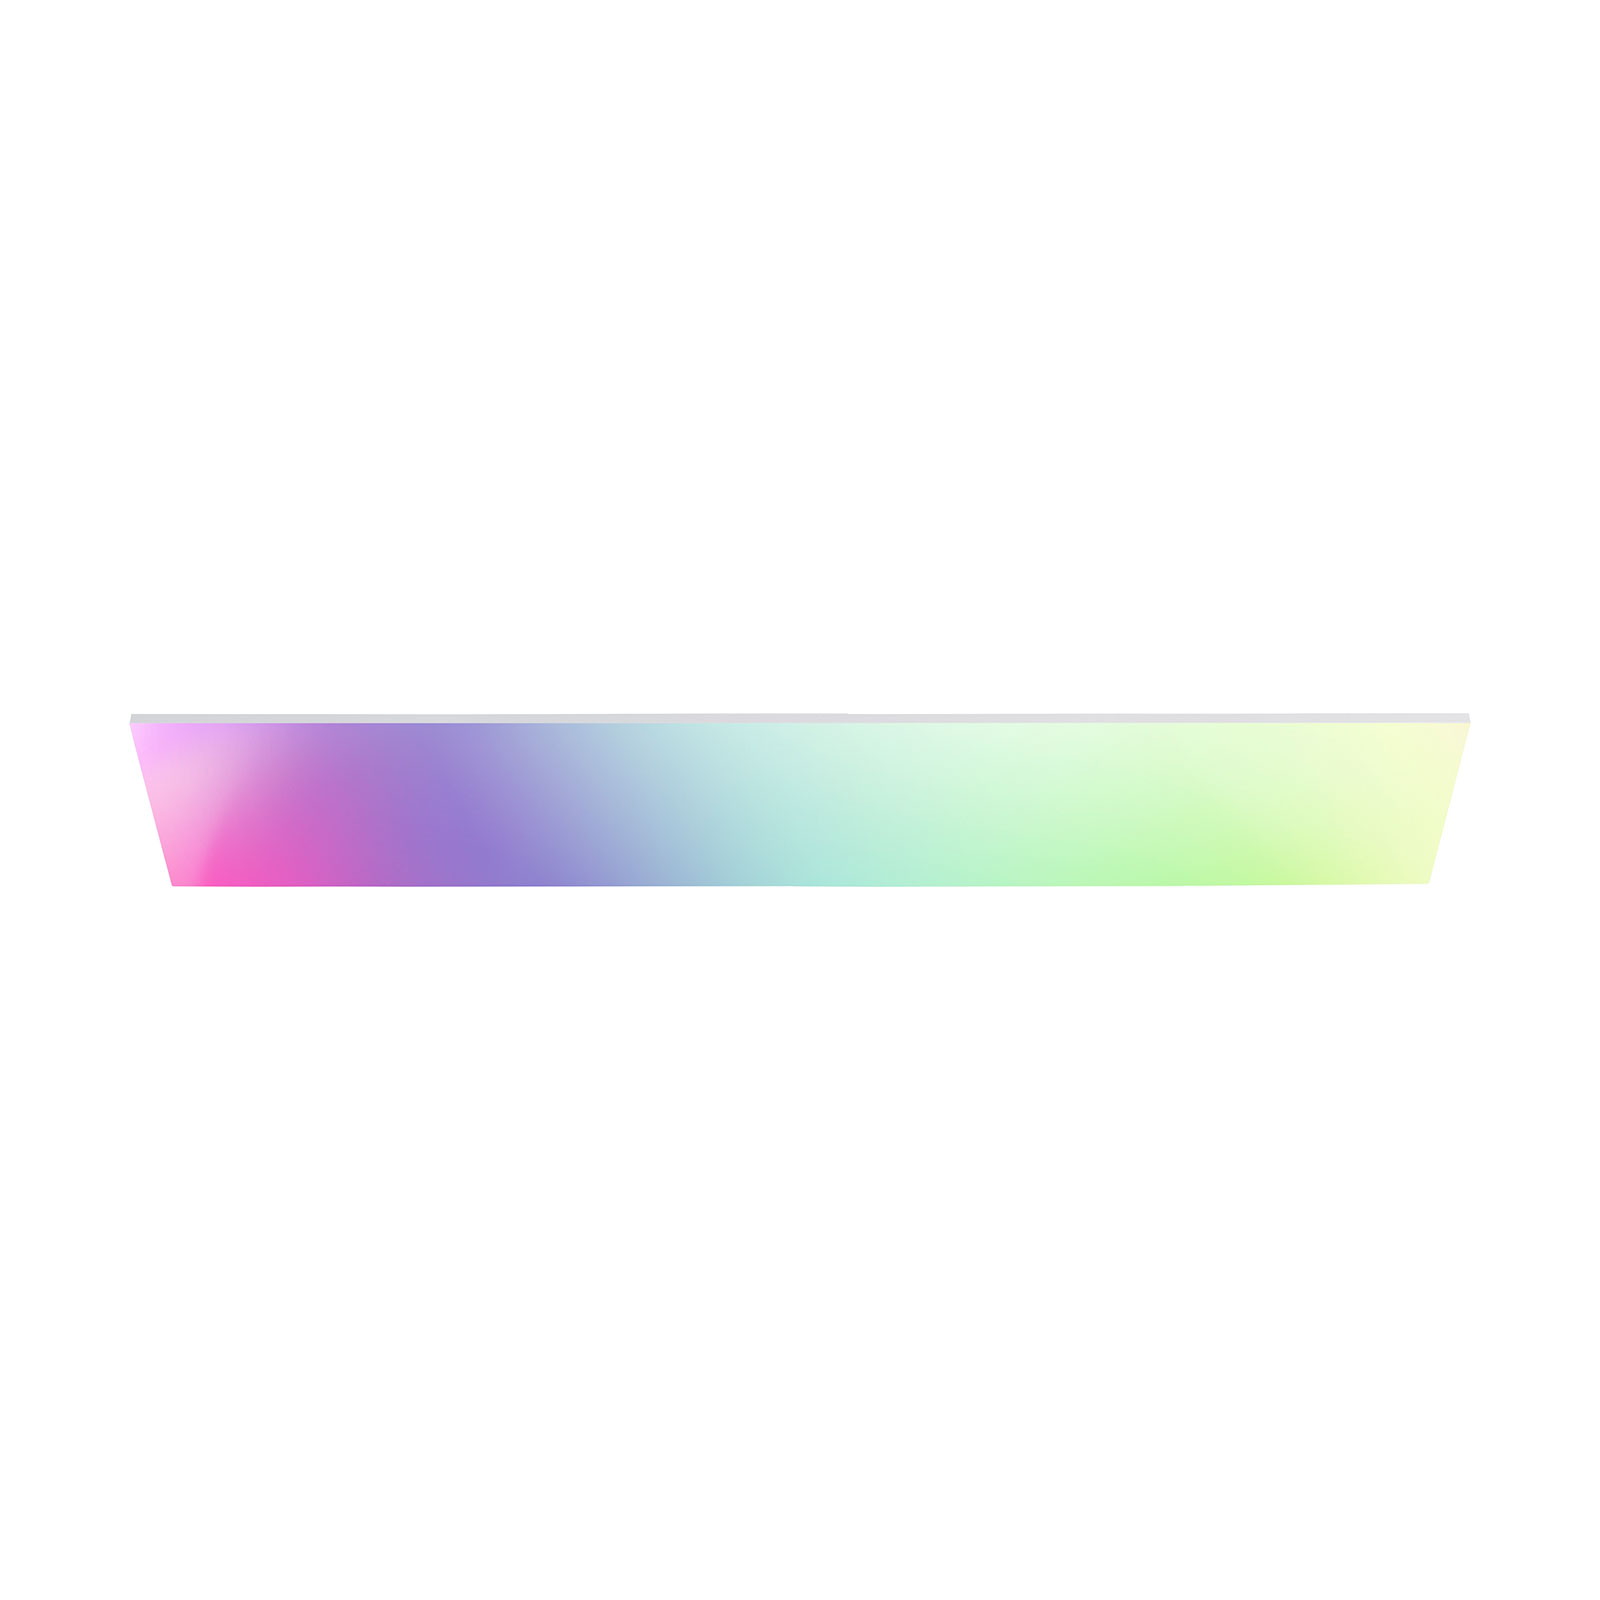 Müller Licht tint LED-panel Aris 120 x 30 cm RGBW